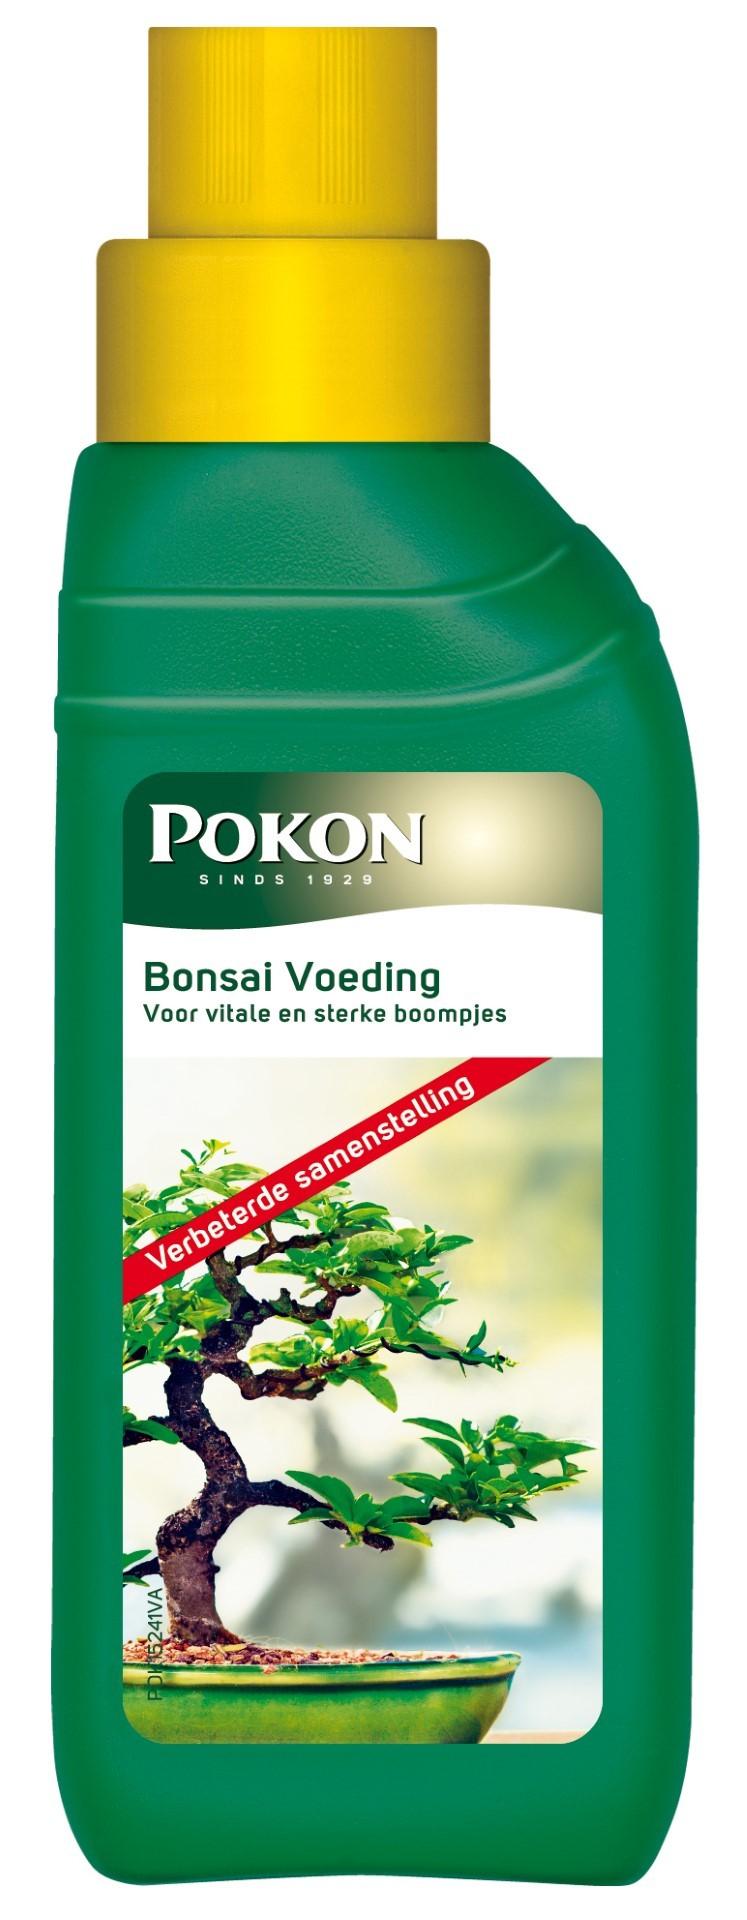 Bonsai Voeding 250ml